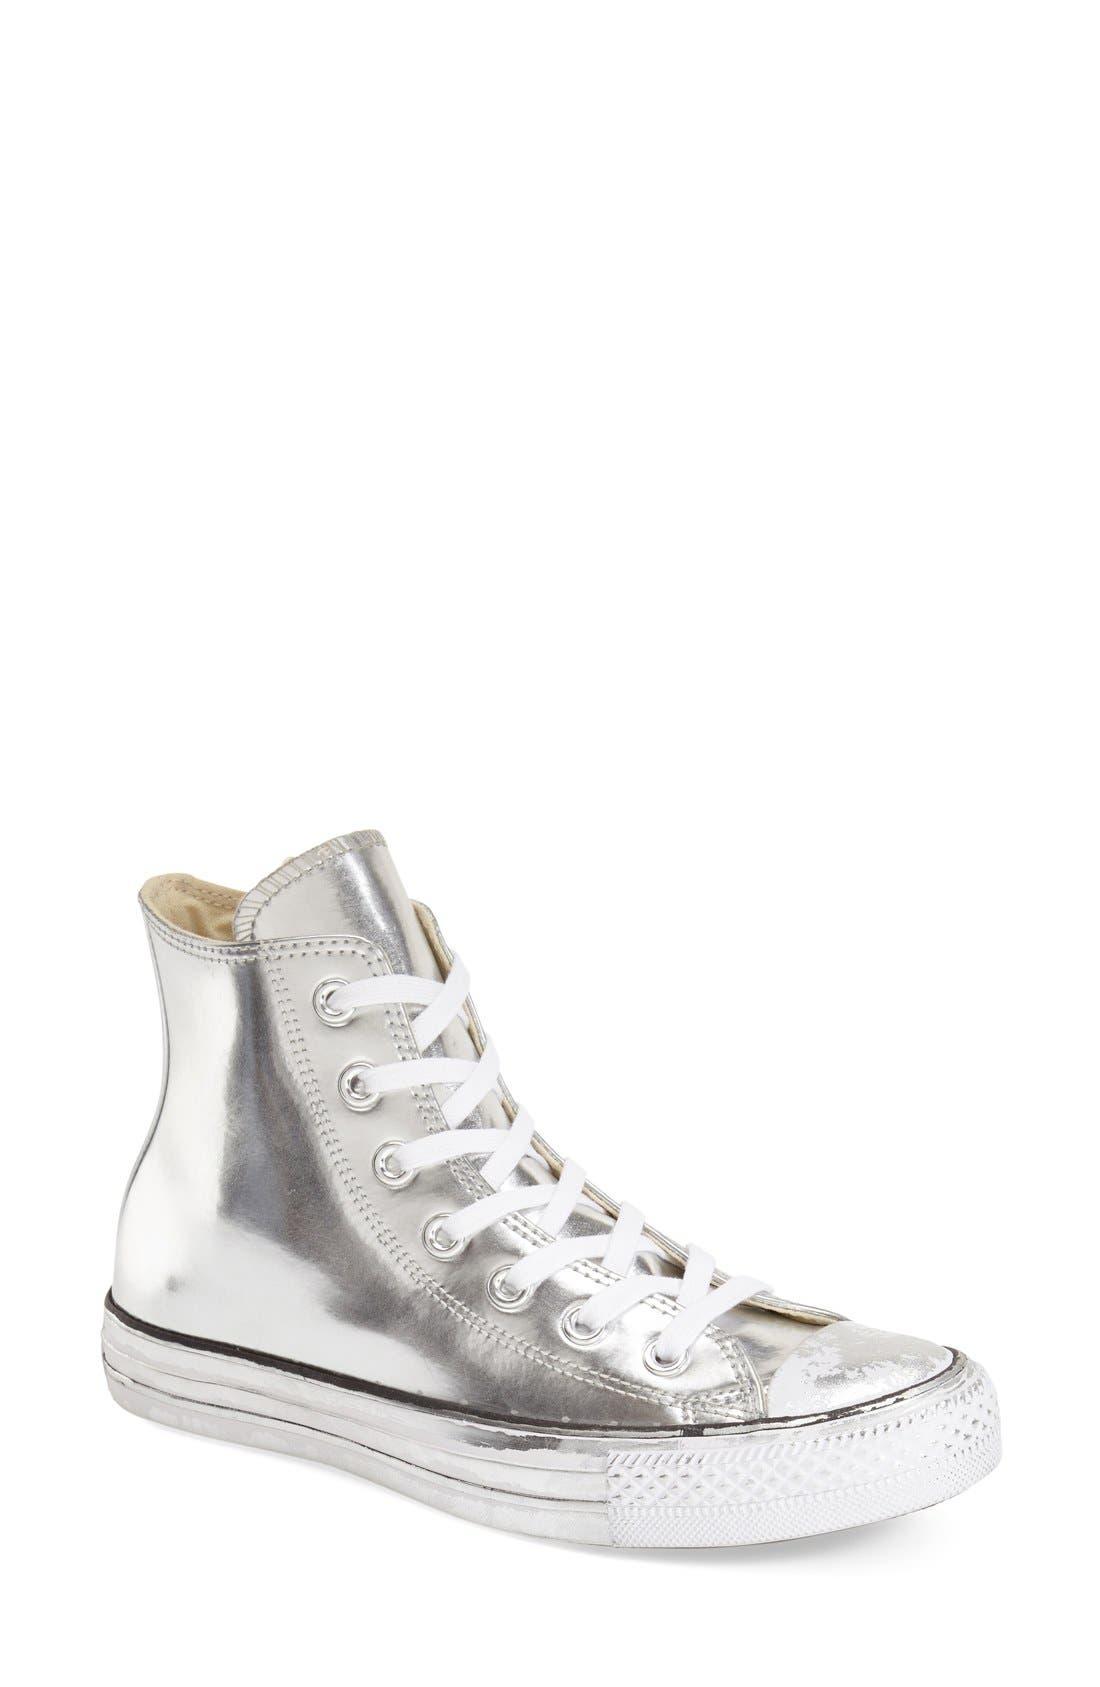 Main Image - Converse Chuck Taylor® All Star® 'Metallic' High Top Sneaker (Women)